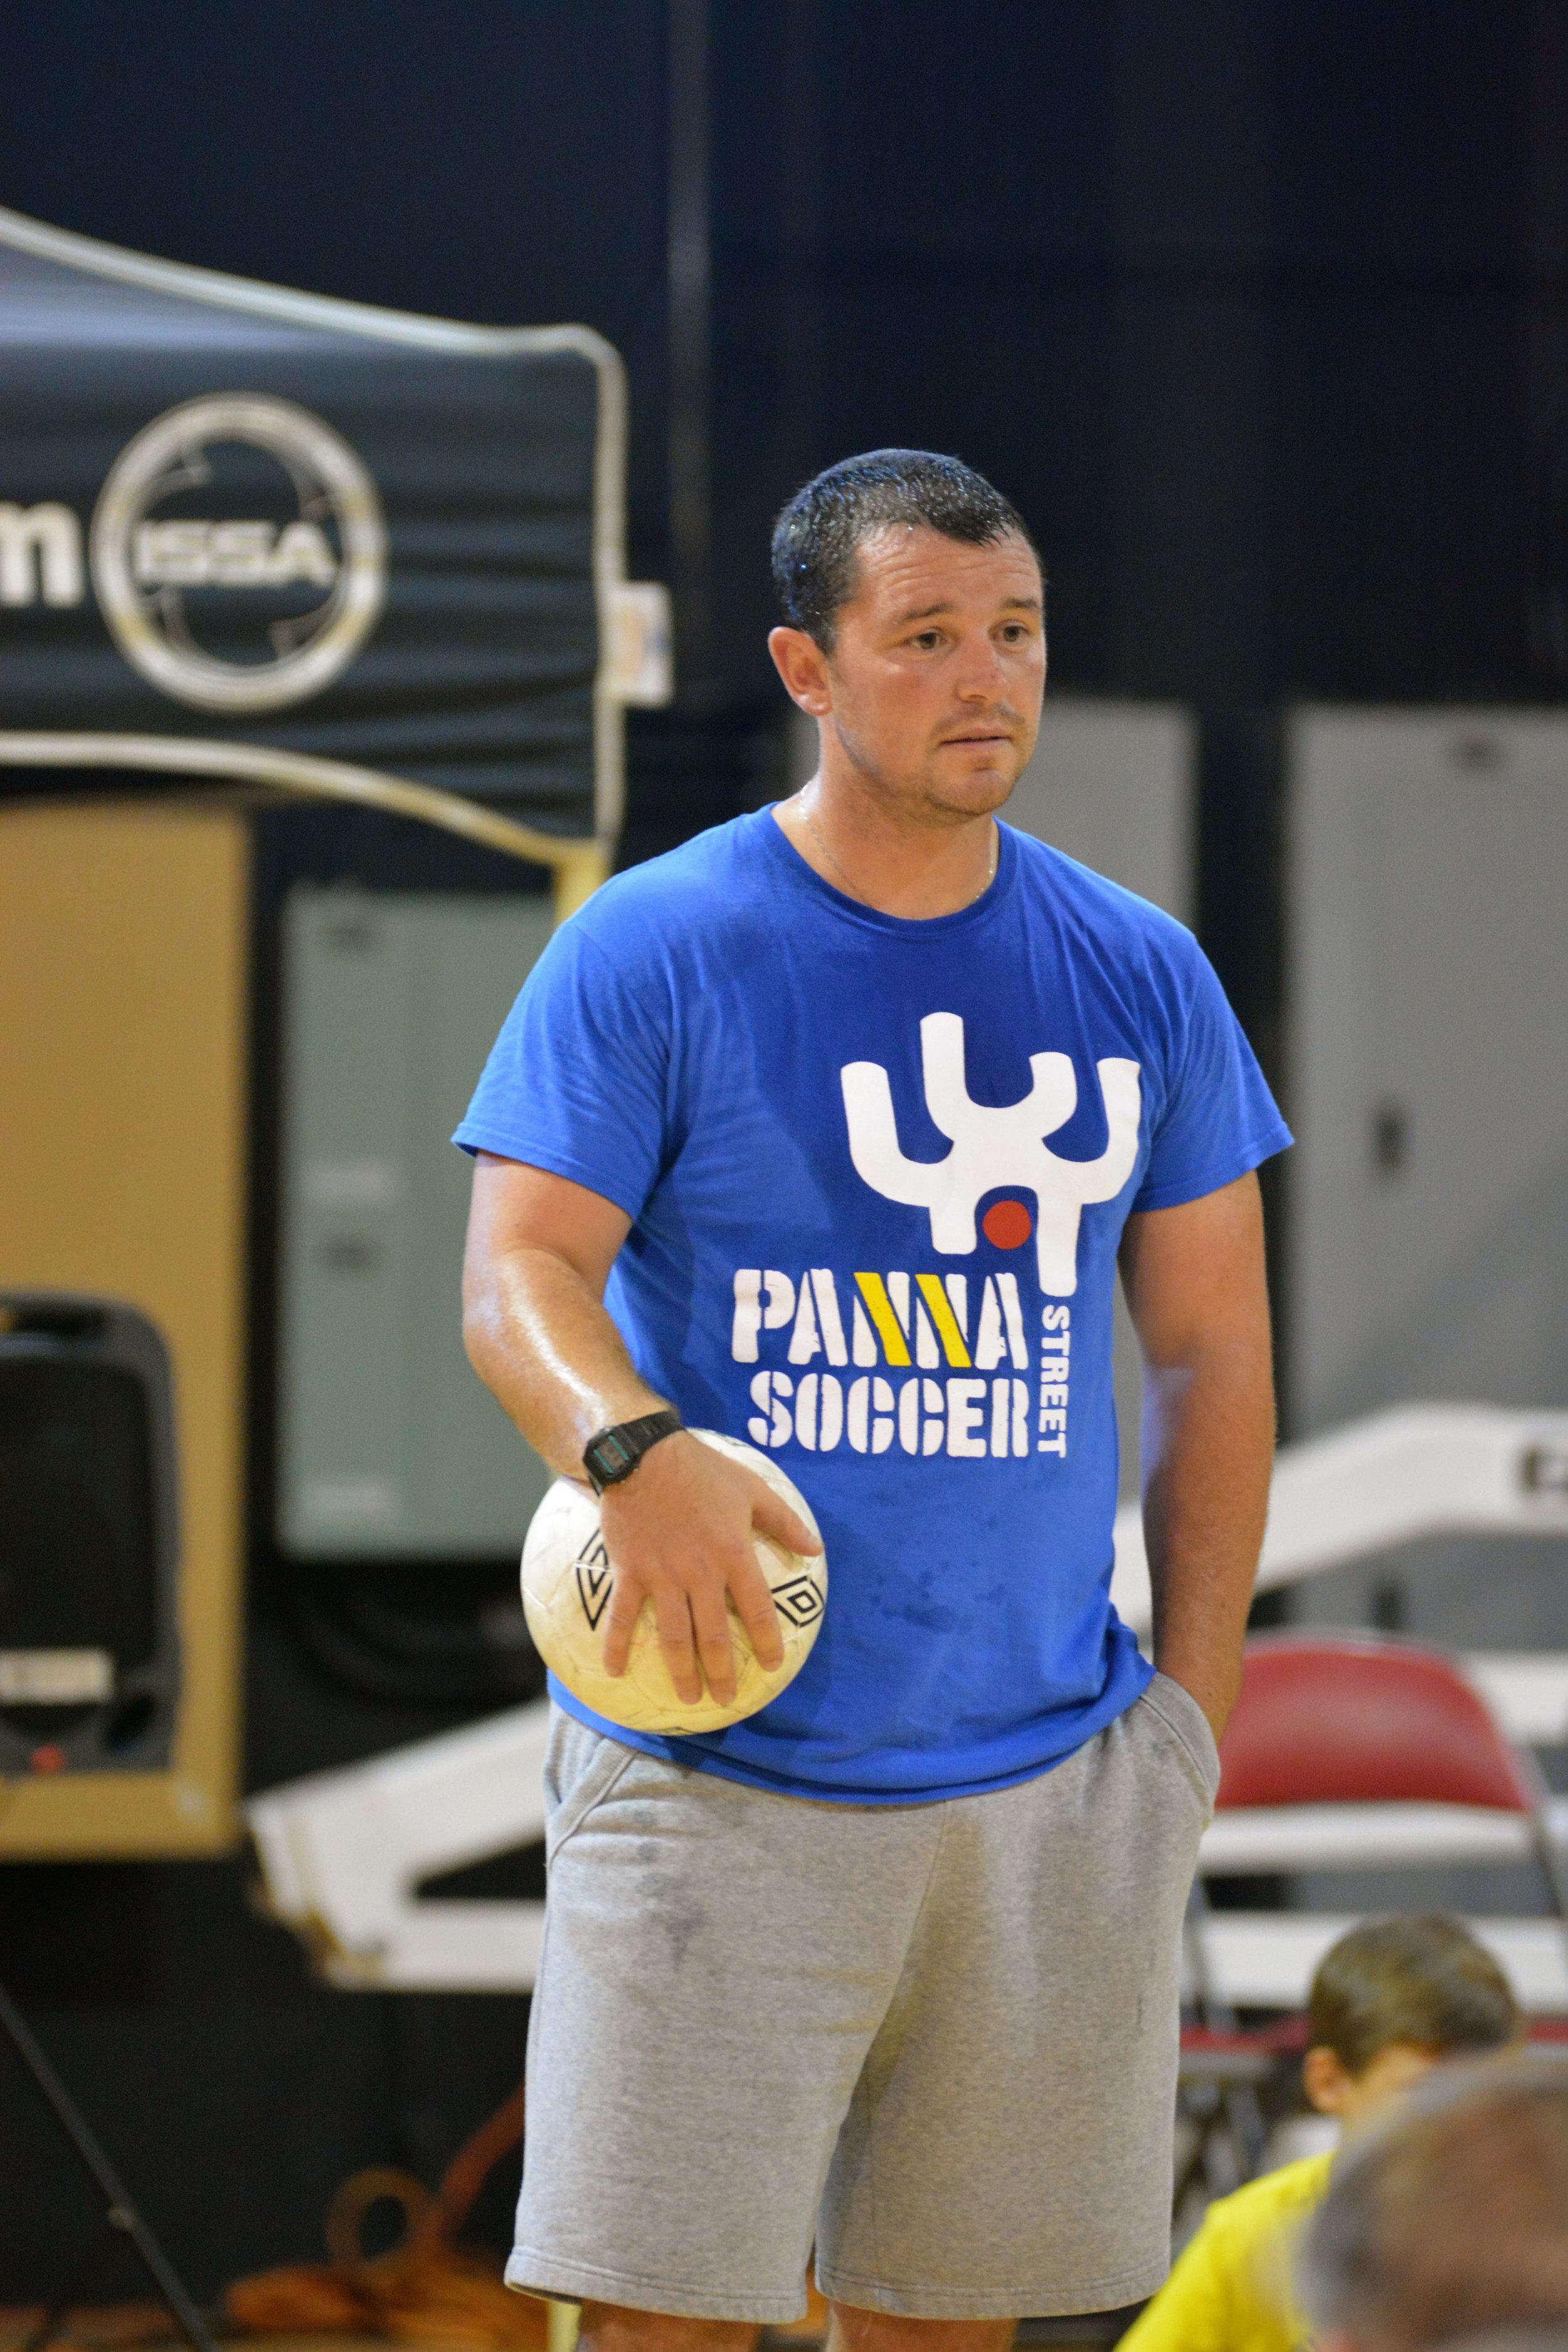 Darren Laver instructor with ball.jpg